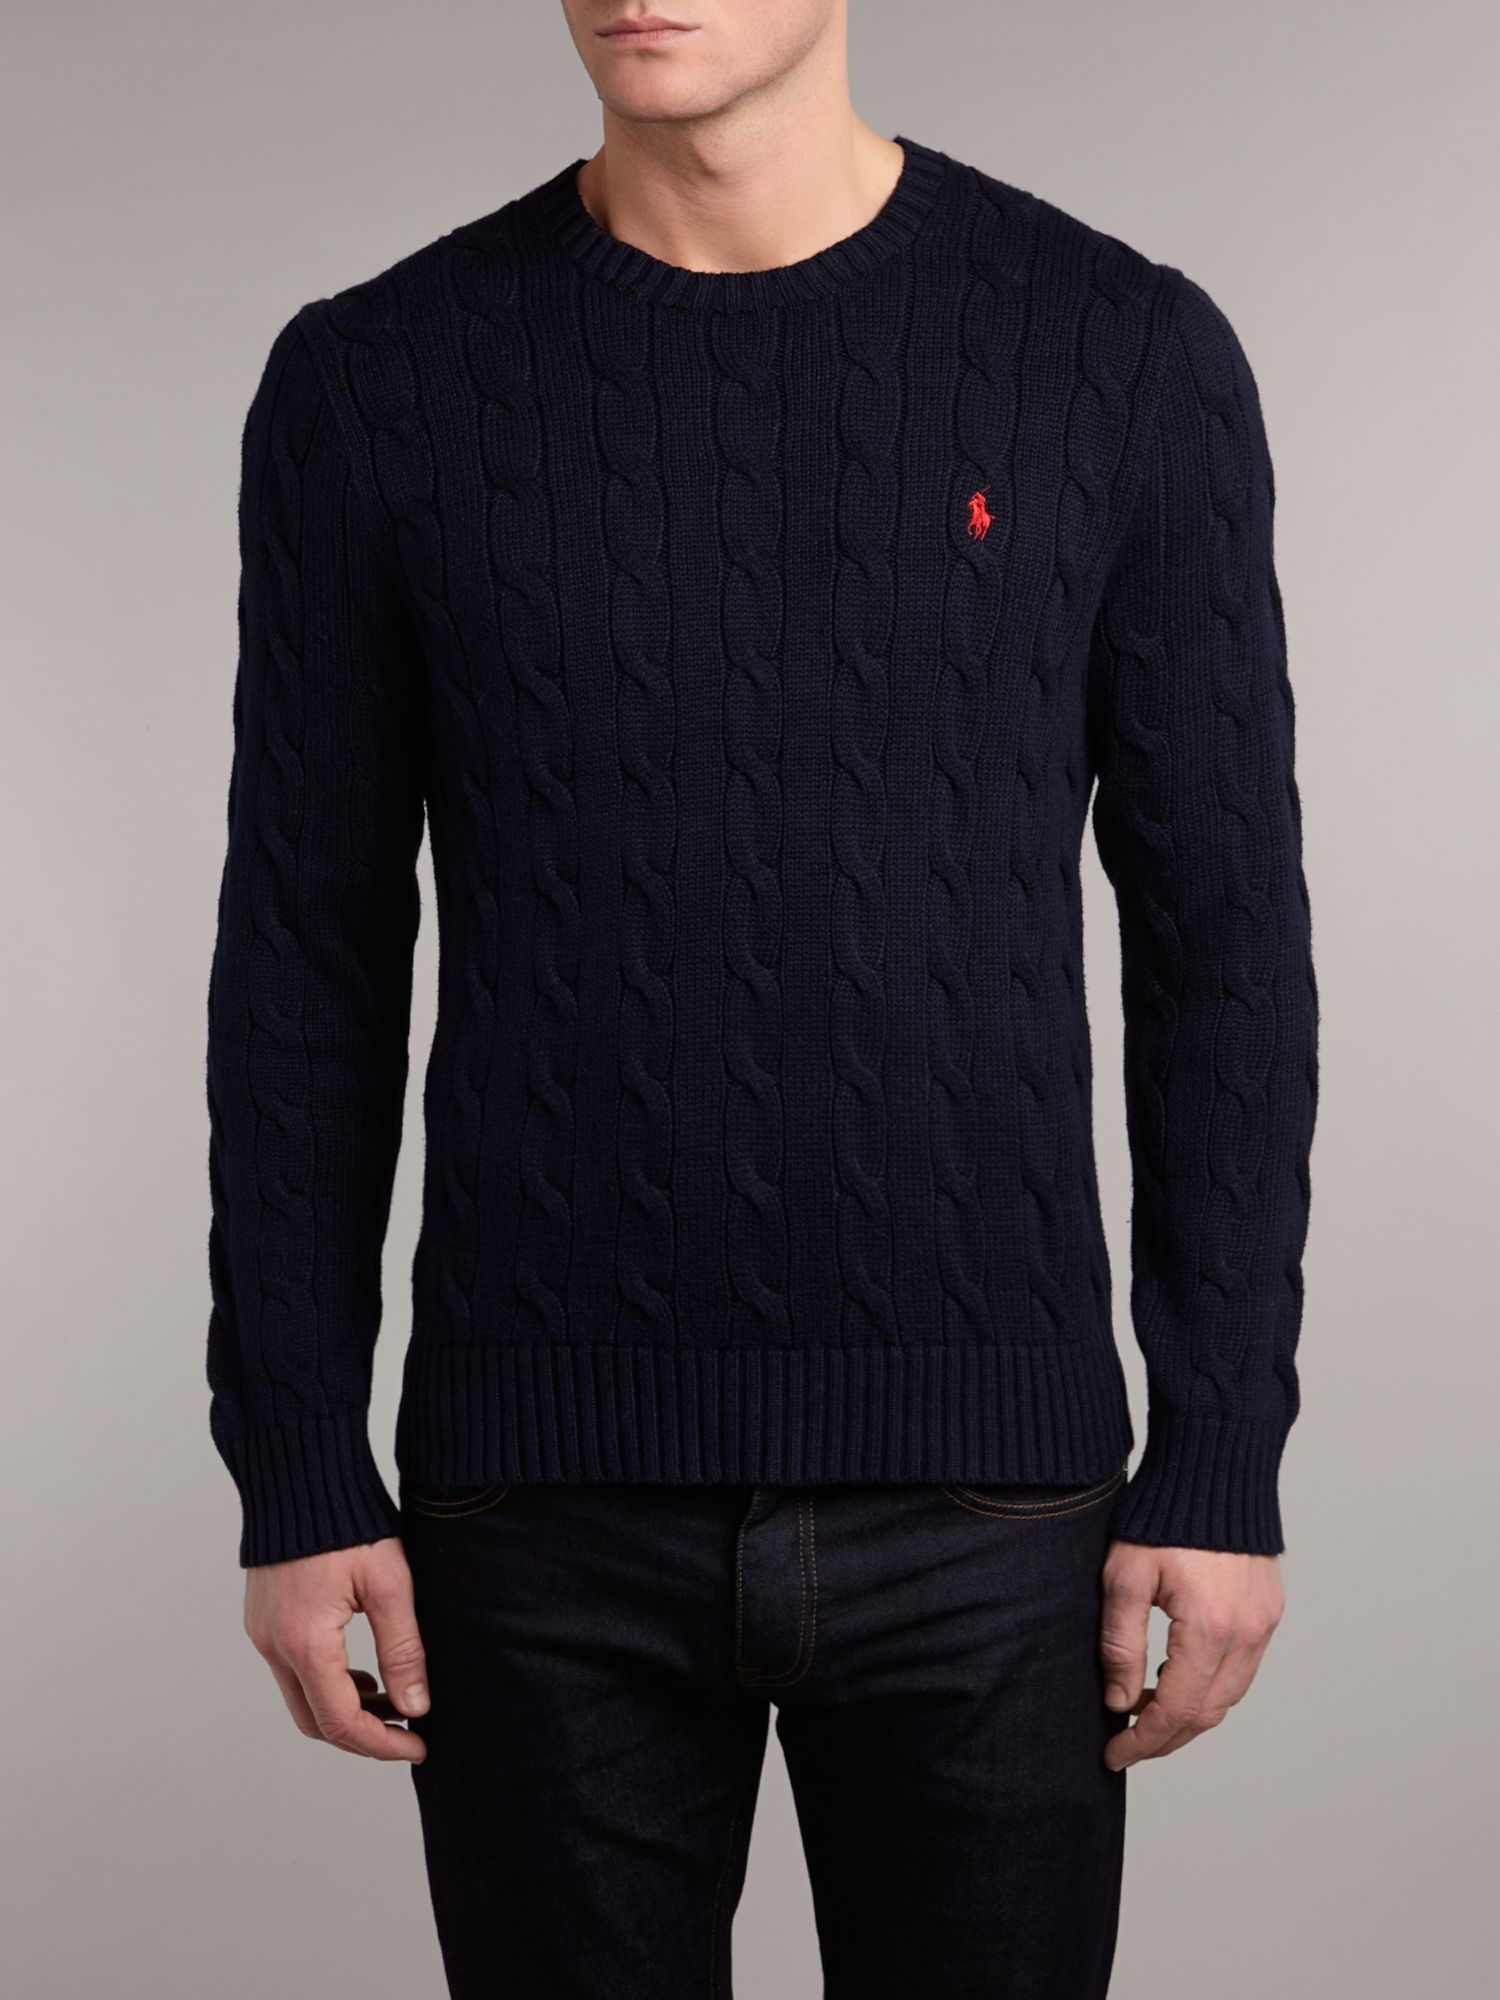 Polo Ralph Lauren Slim Fit Sweater In Blue For Men Lyst